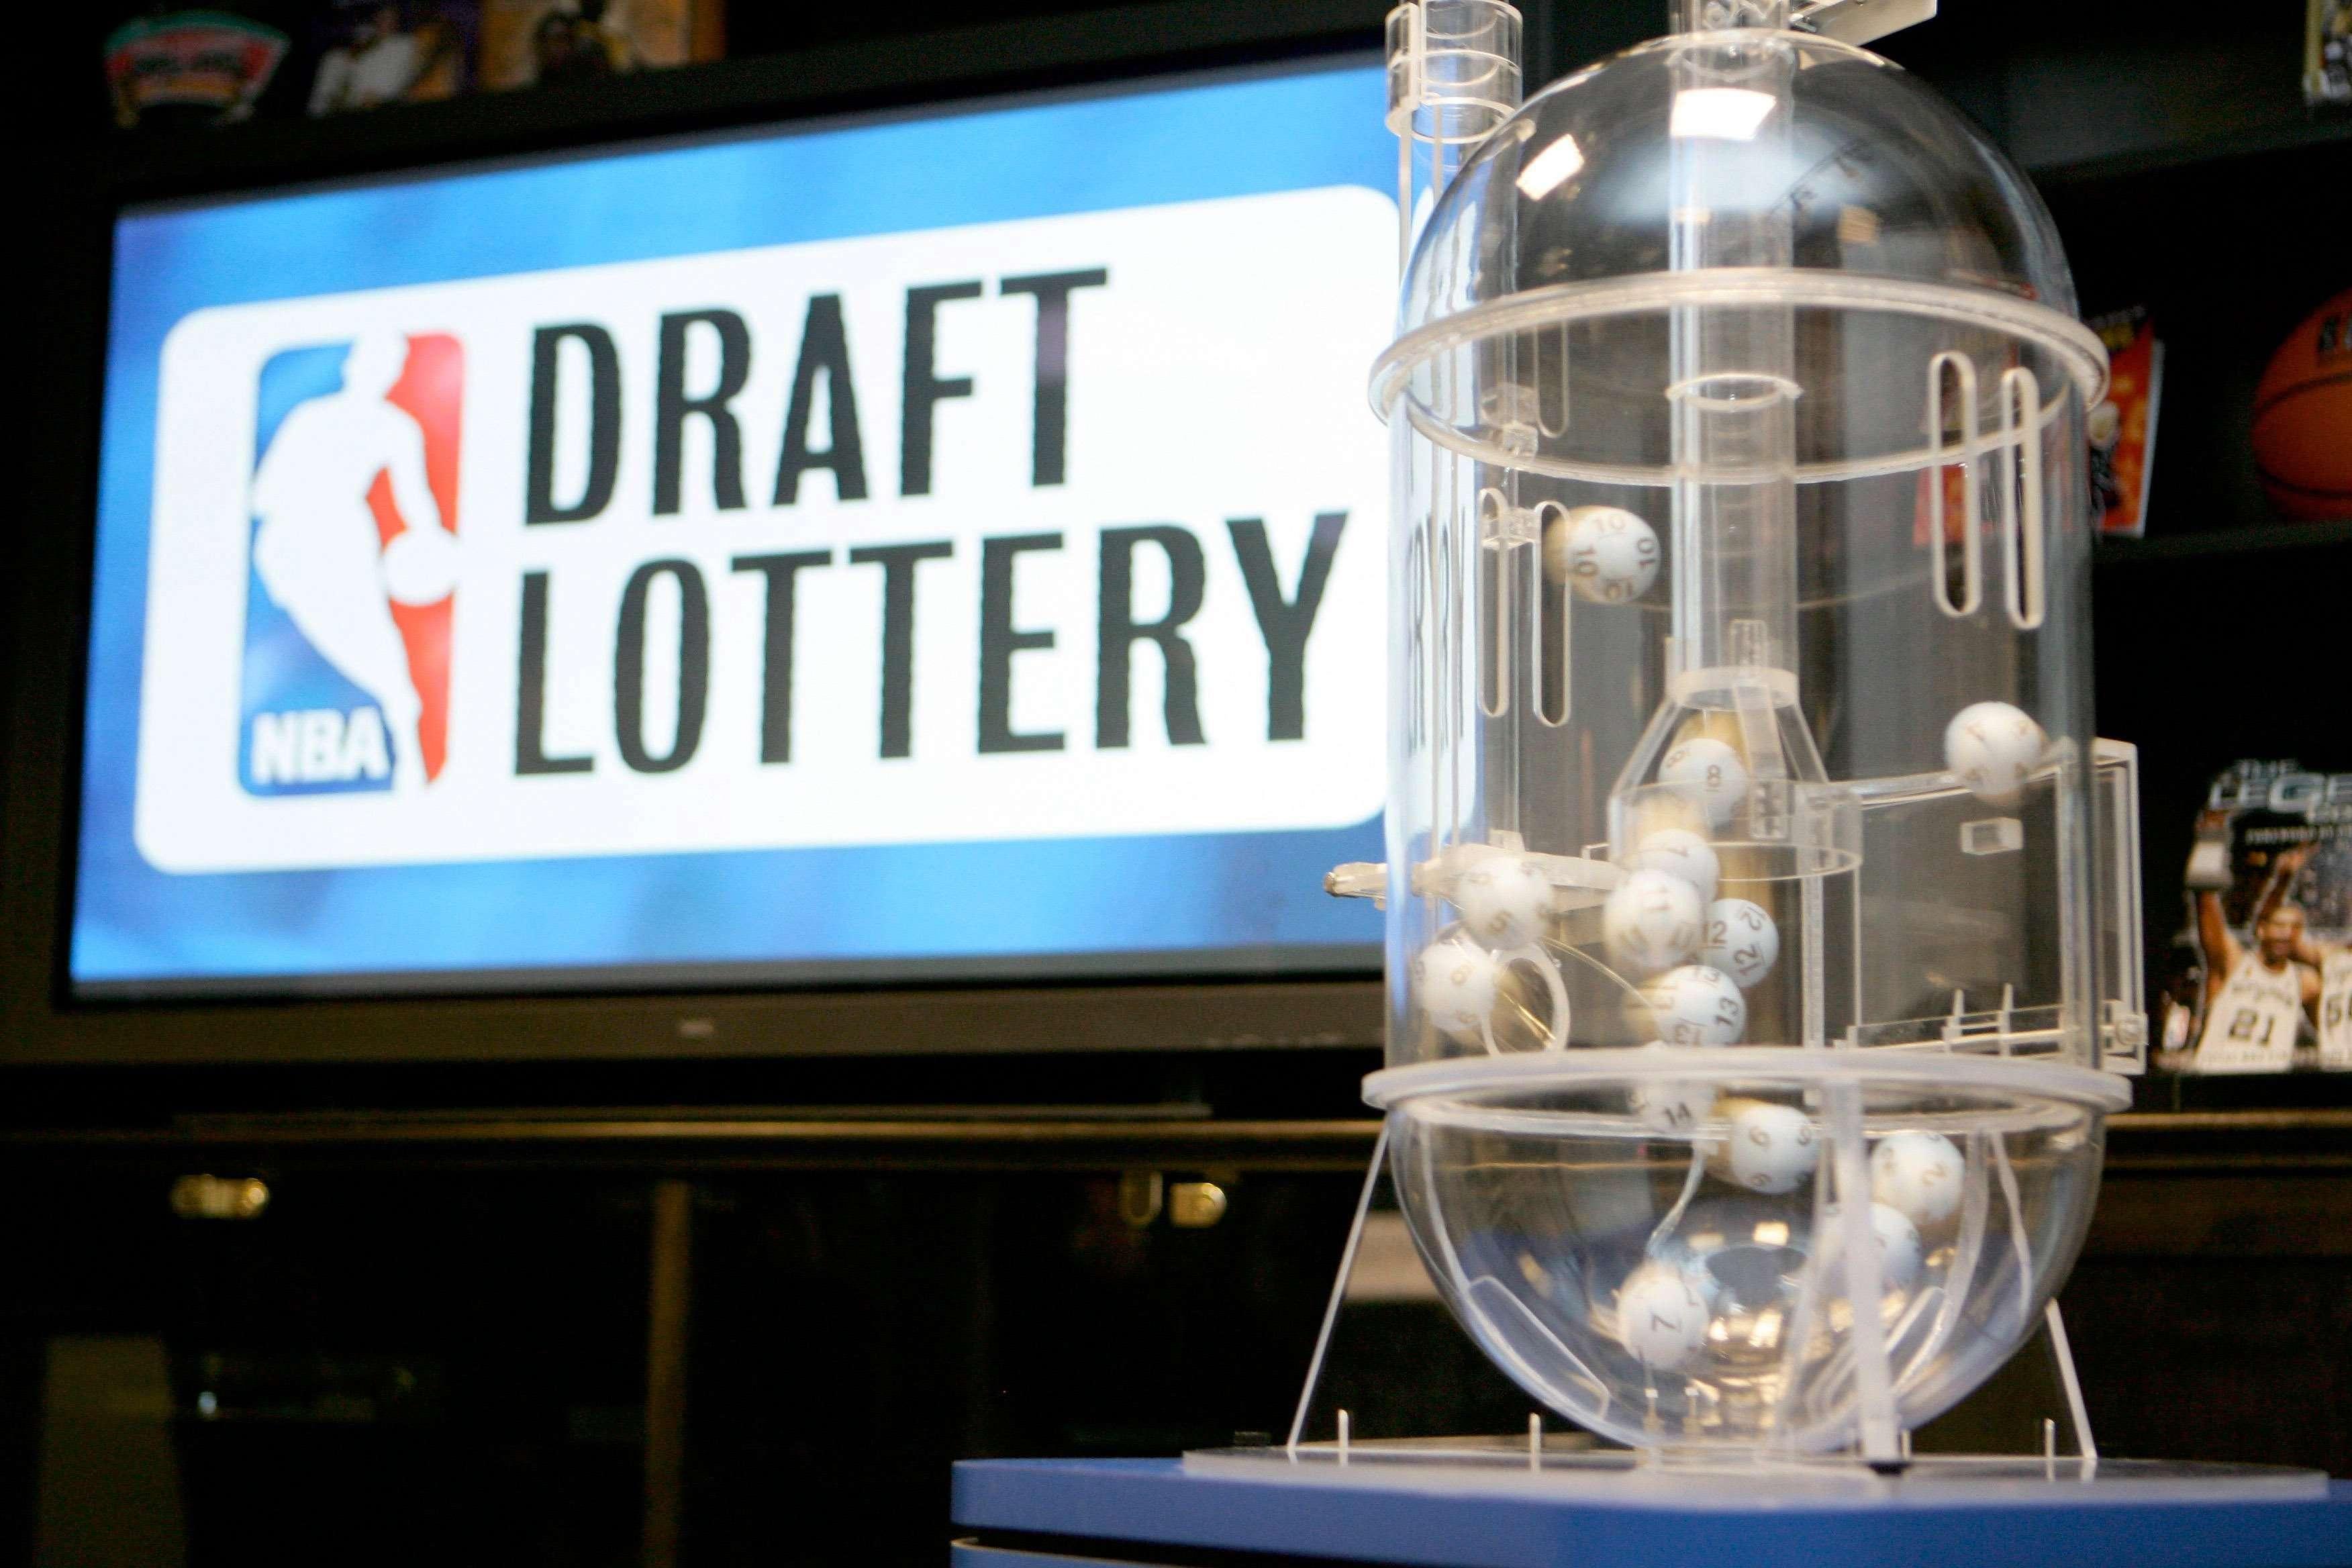 nba draft lottery-2019 nba draft-zion williamson-odds-prop-bet